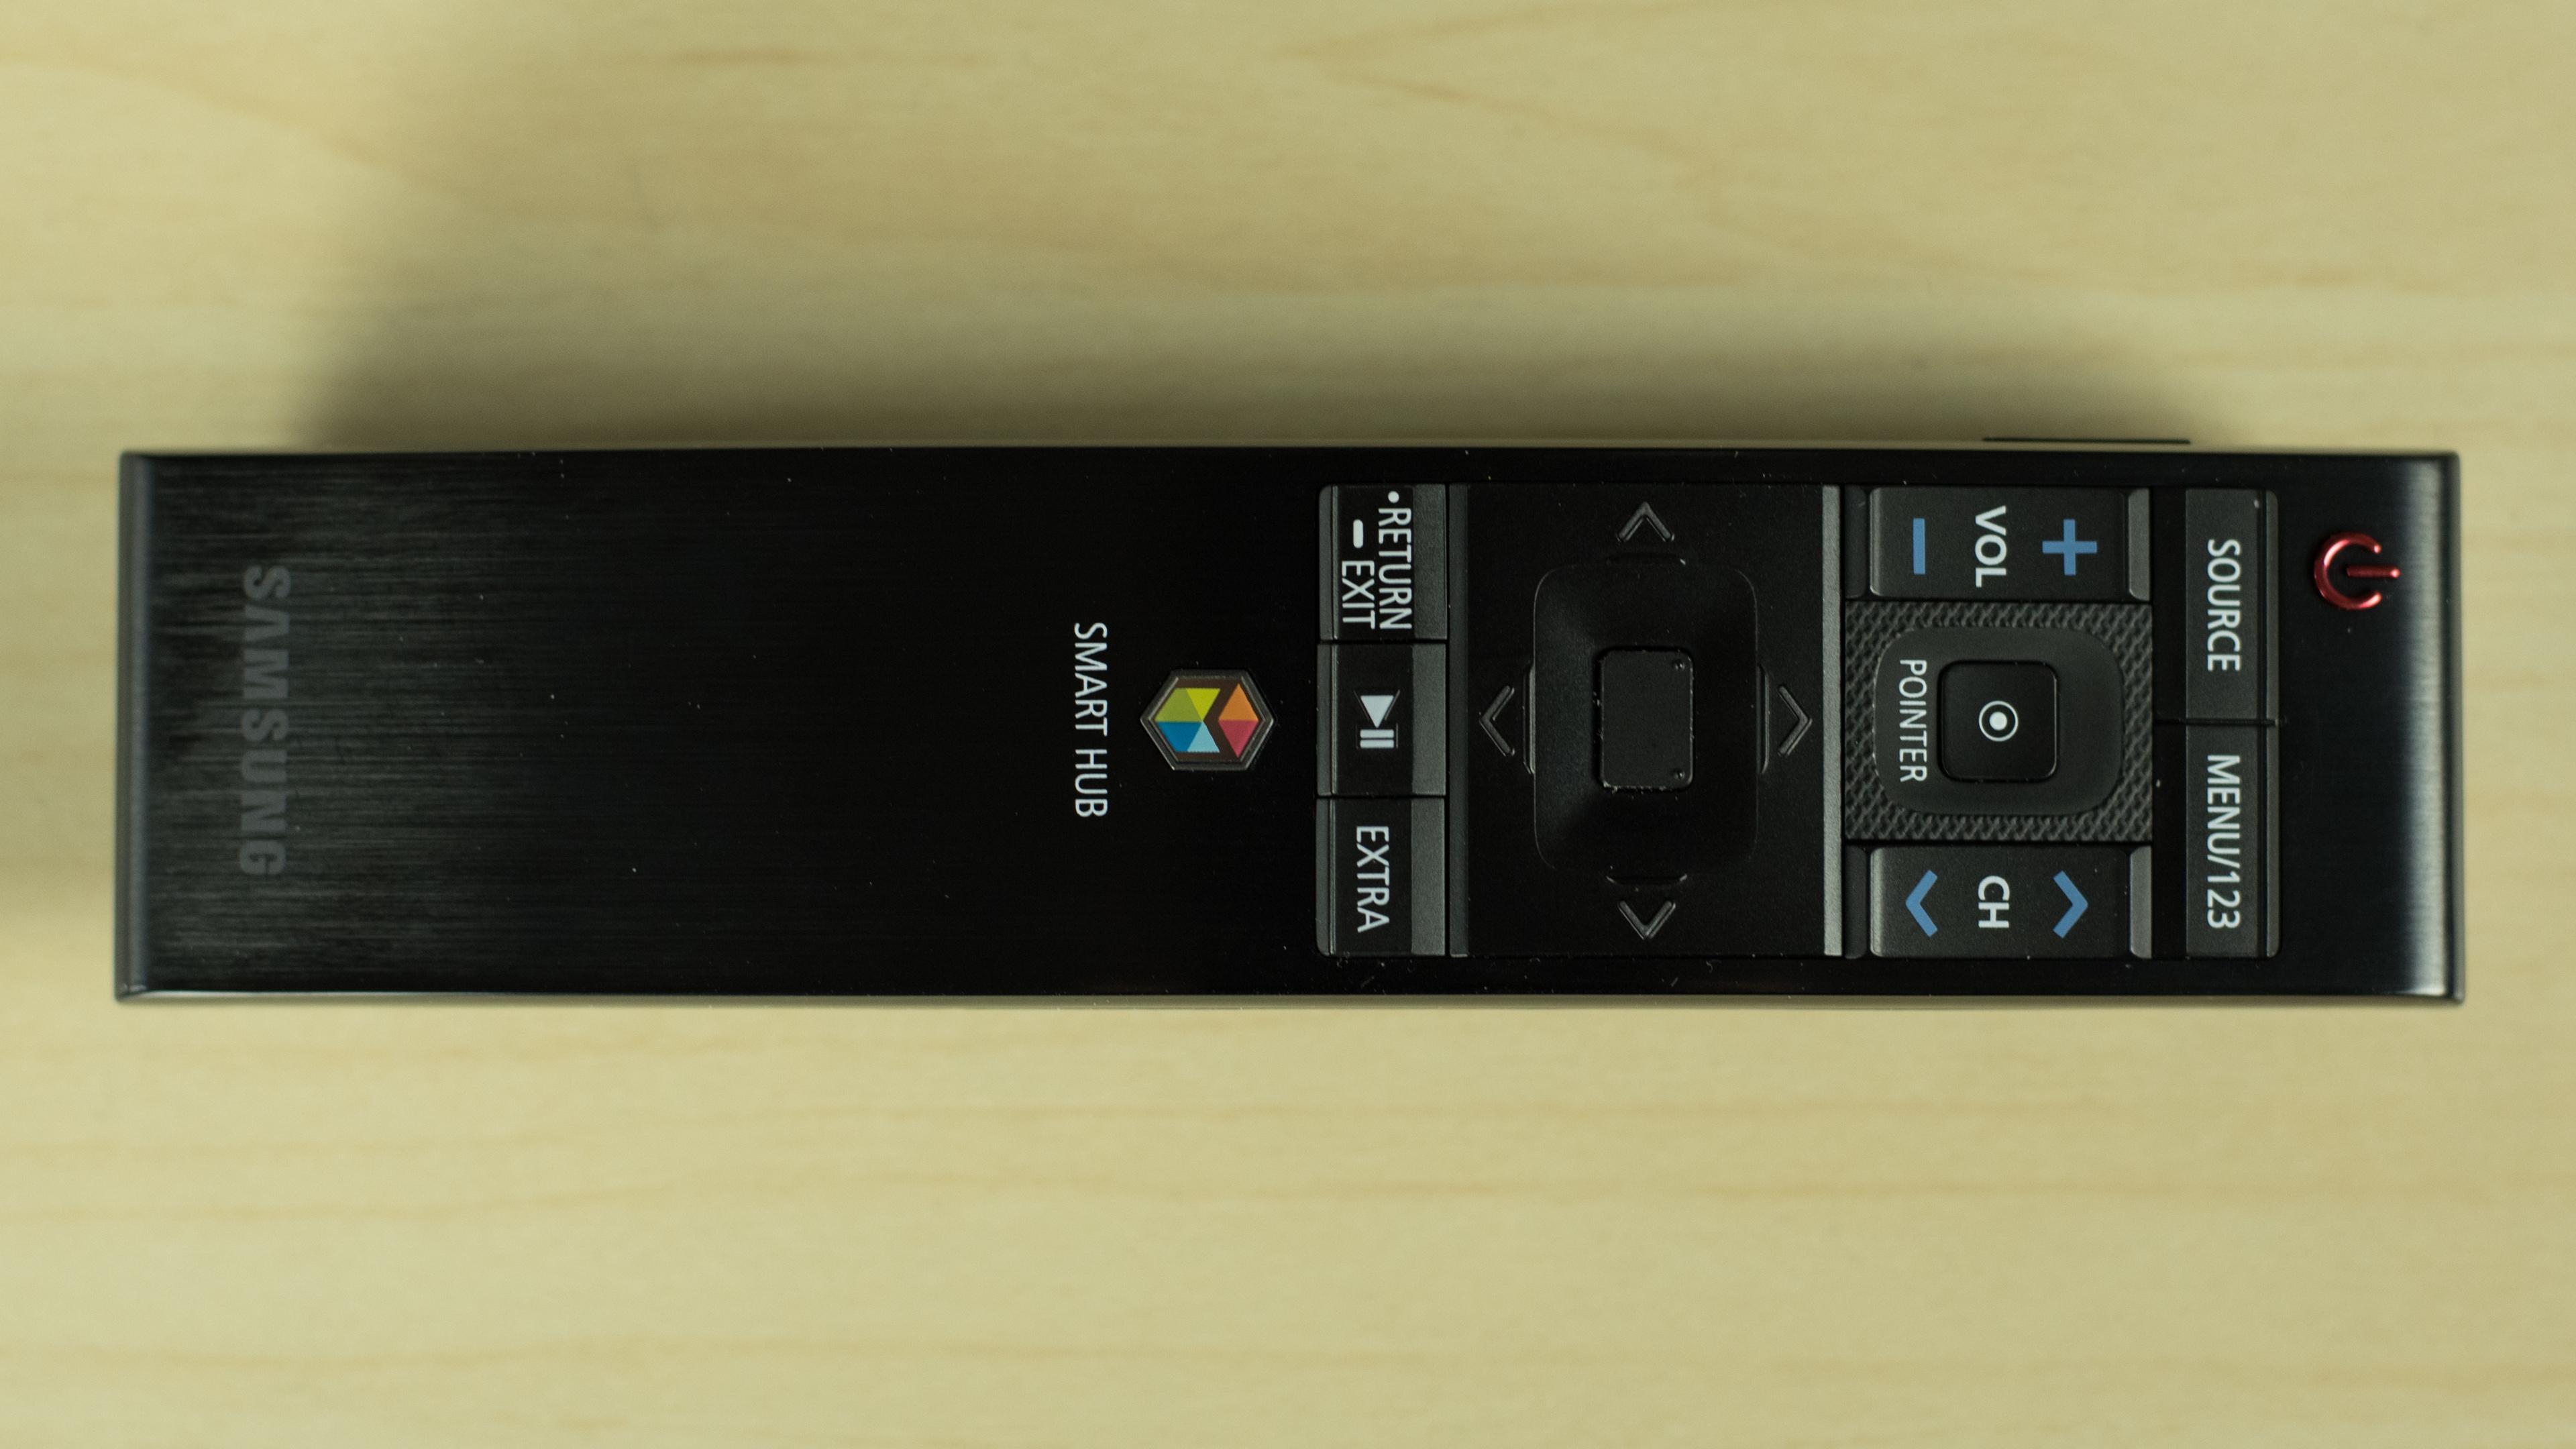 Samsung Ju7100 Review Un40ju7100 Un50ju7100 Un55ju7100